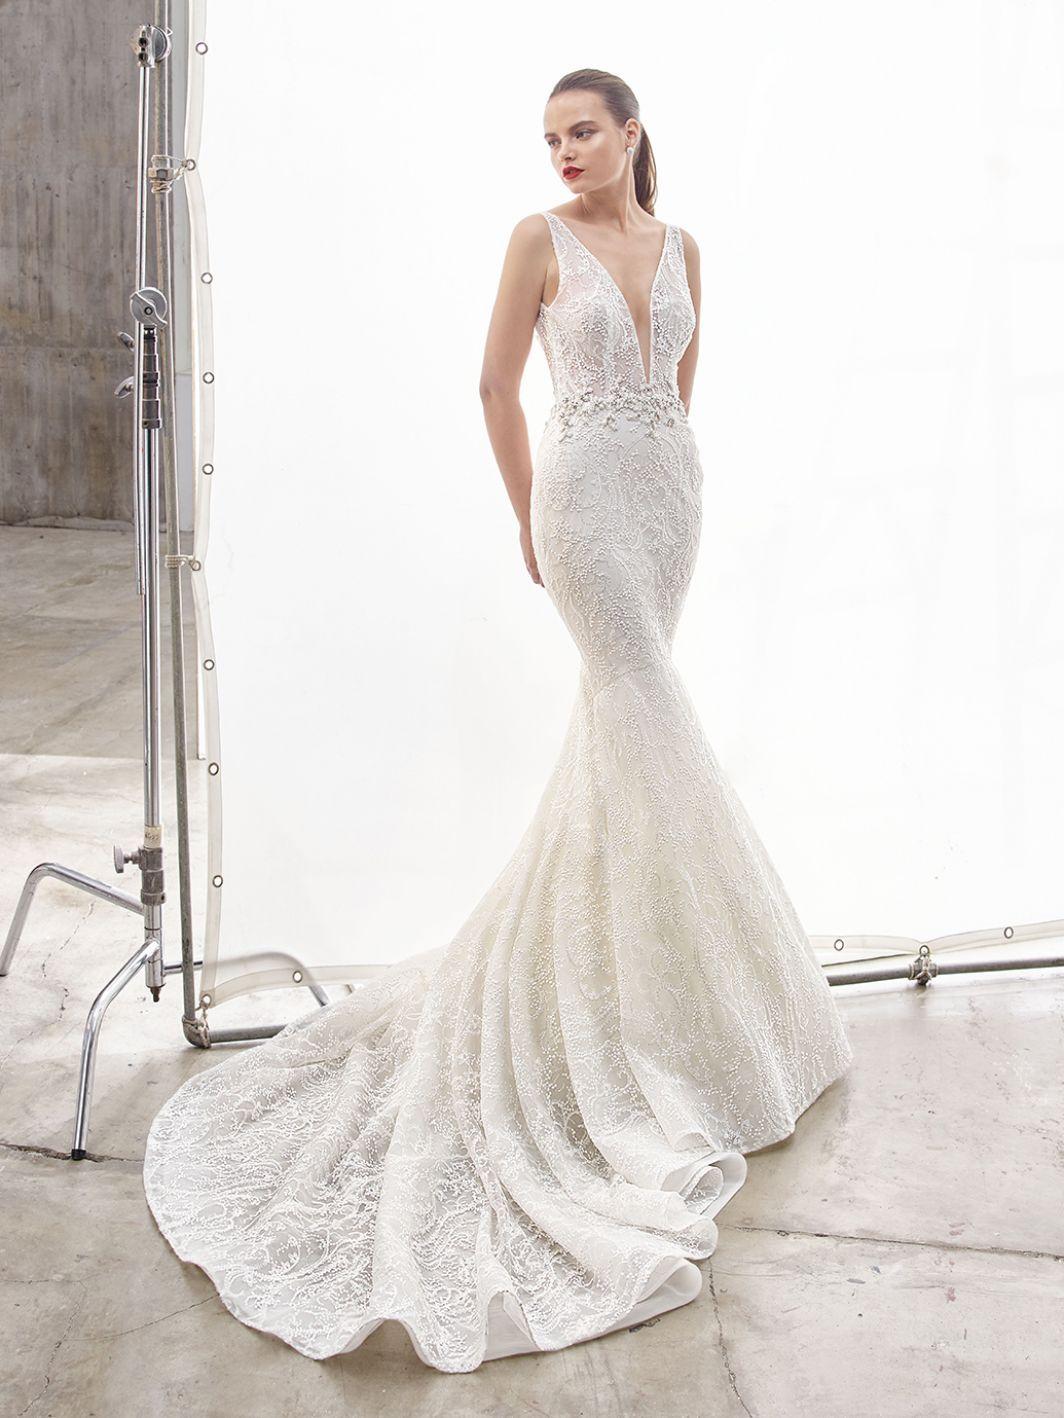 11991c2ad47fa NORTH   Enzoani 2019   2019 Enzoani Collection   Wedding dresses ...